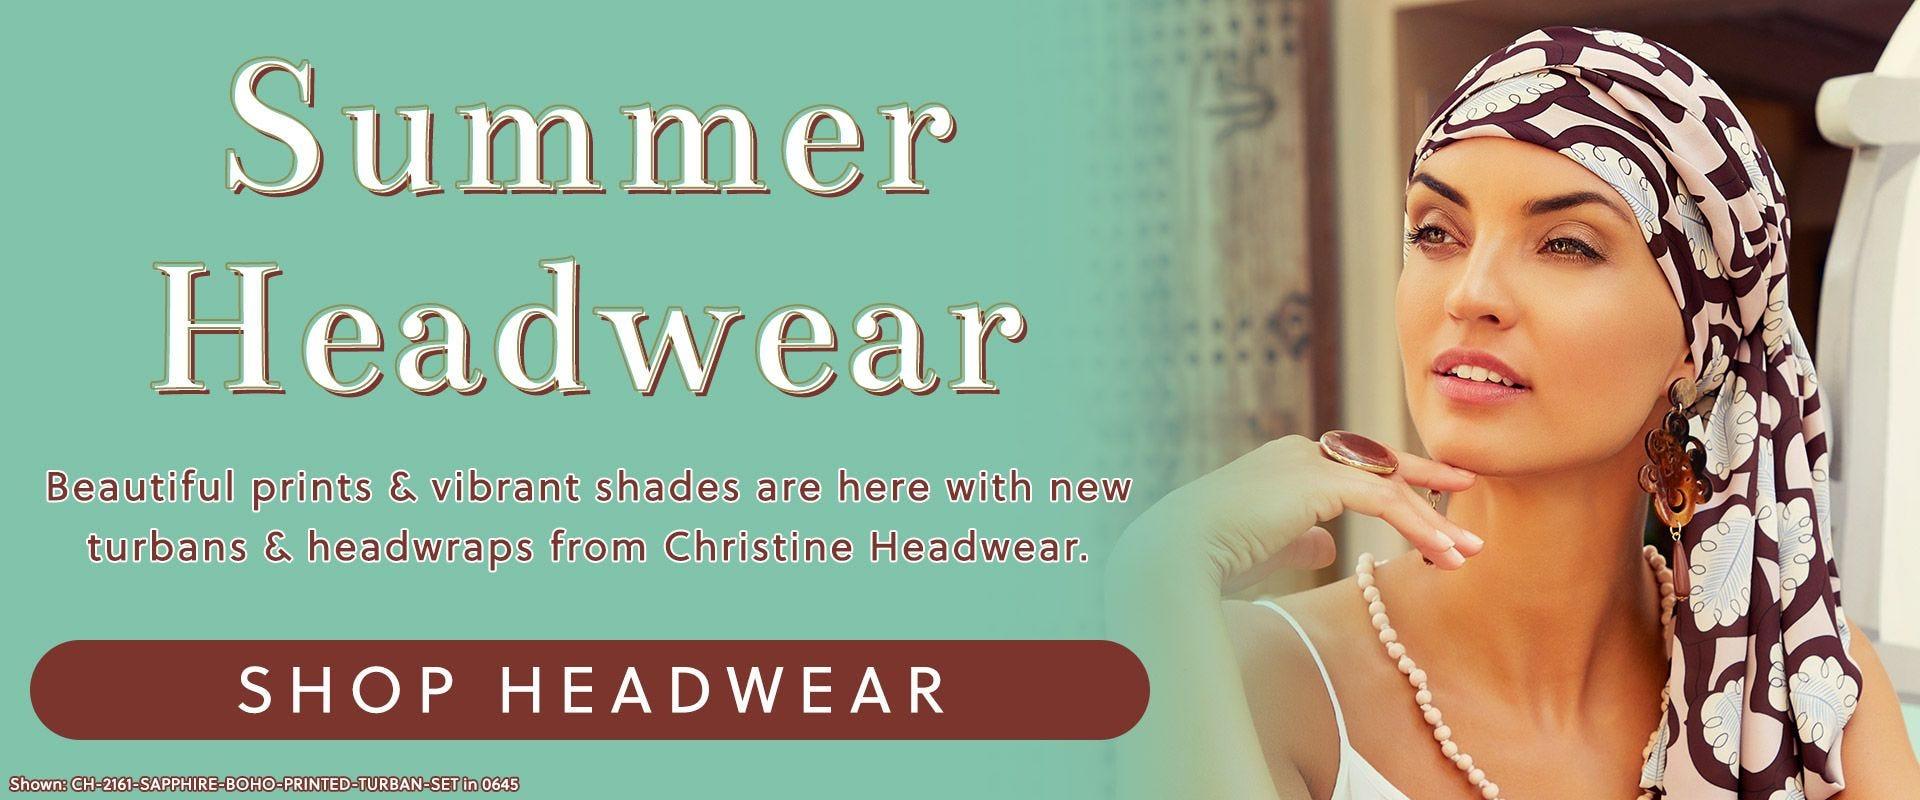 Shop Summer Headwear From Christine Headwear, Ellen Wille, & More